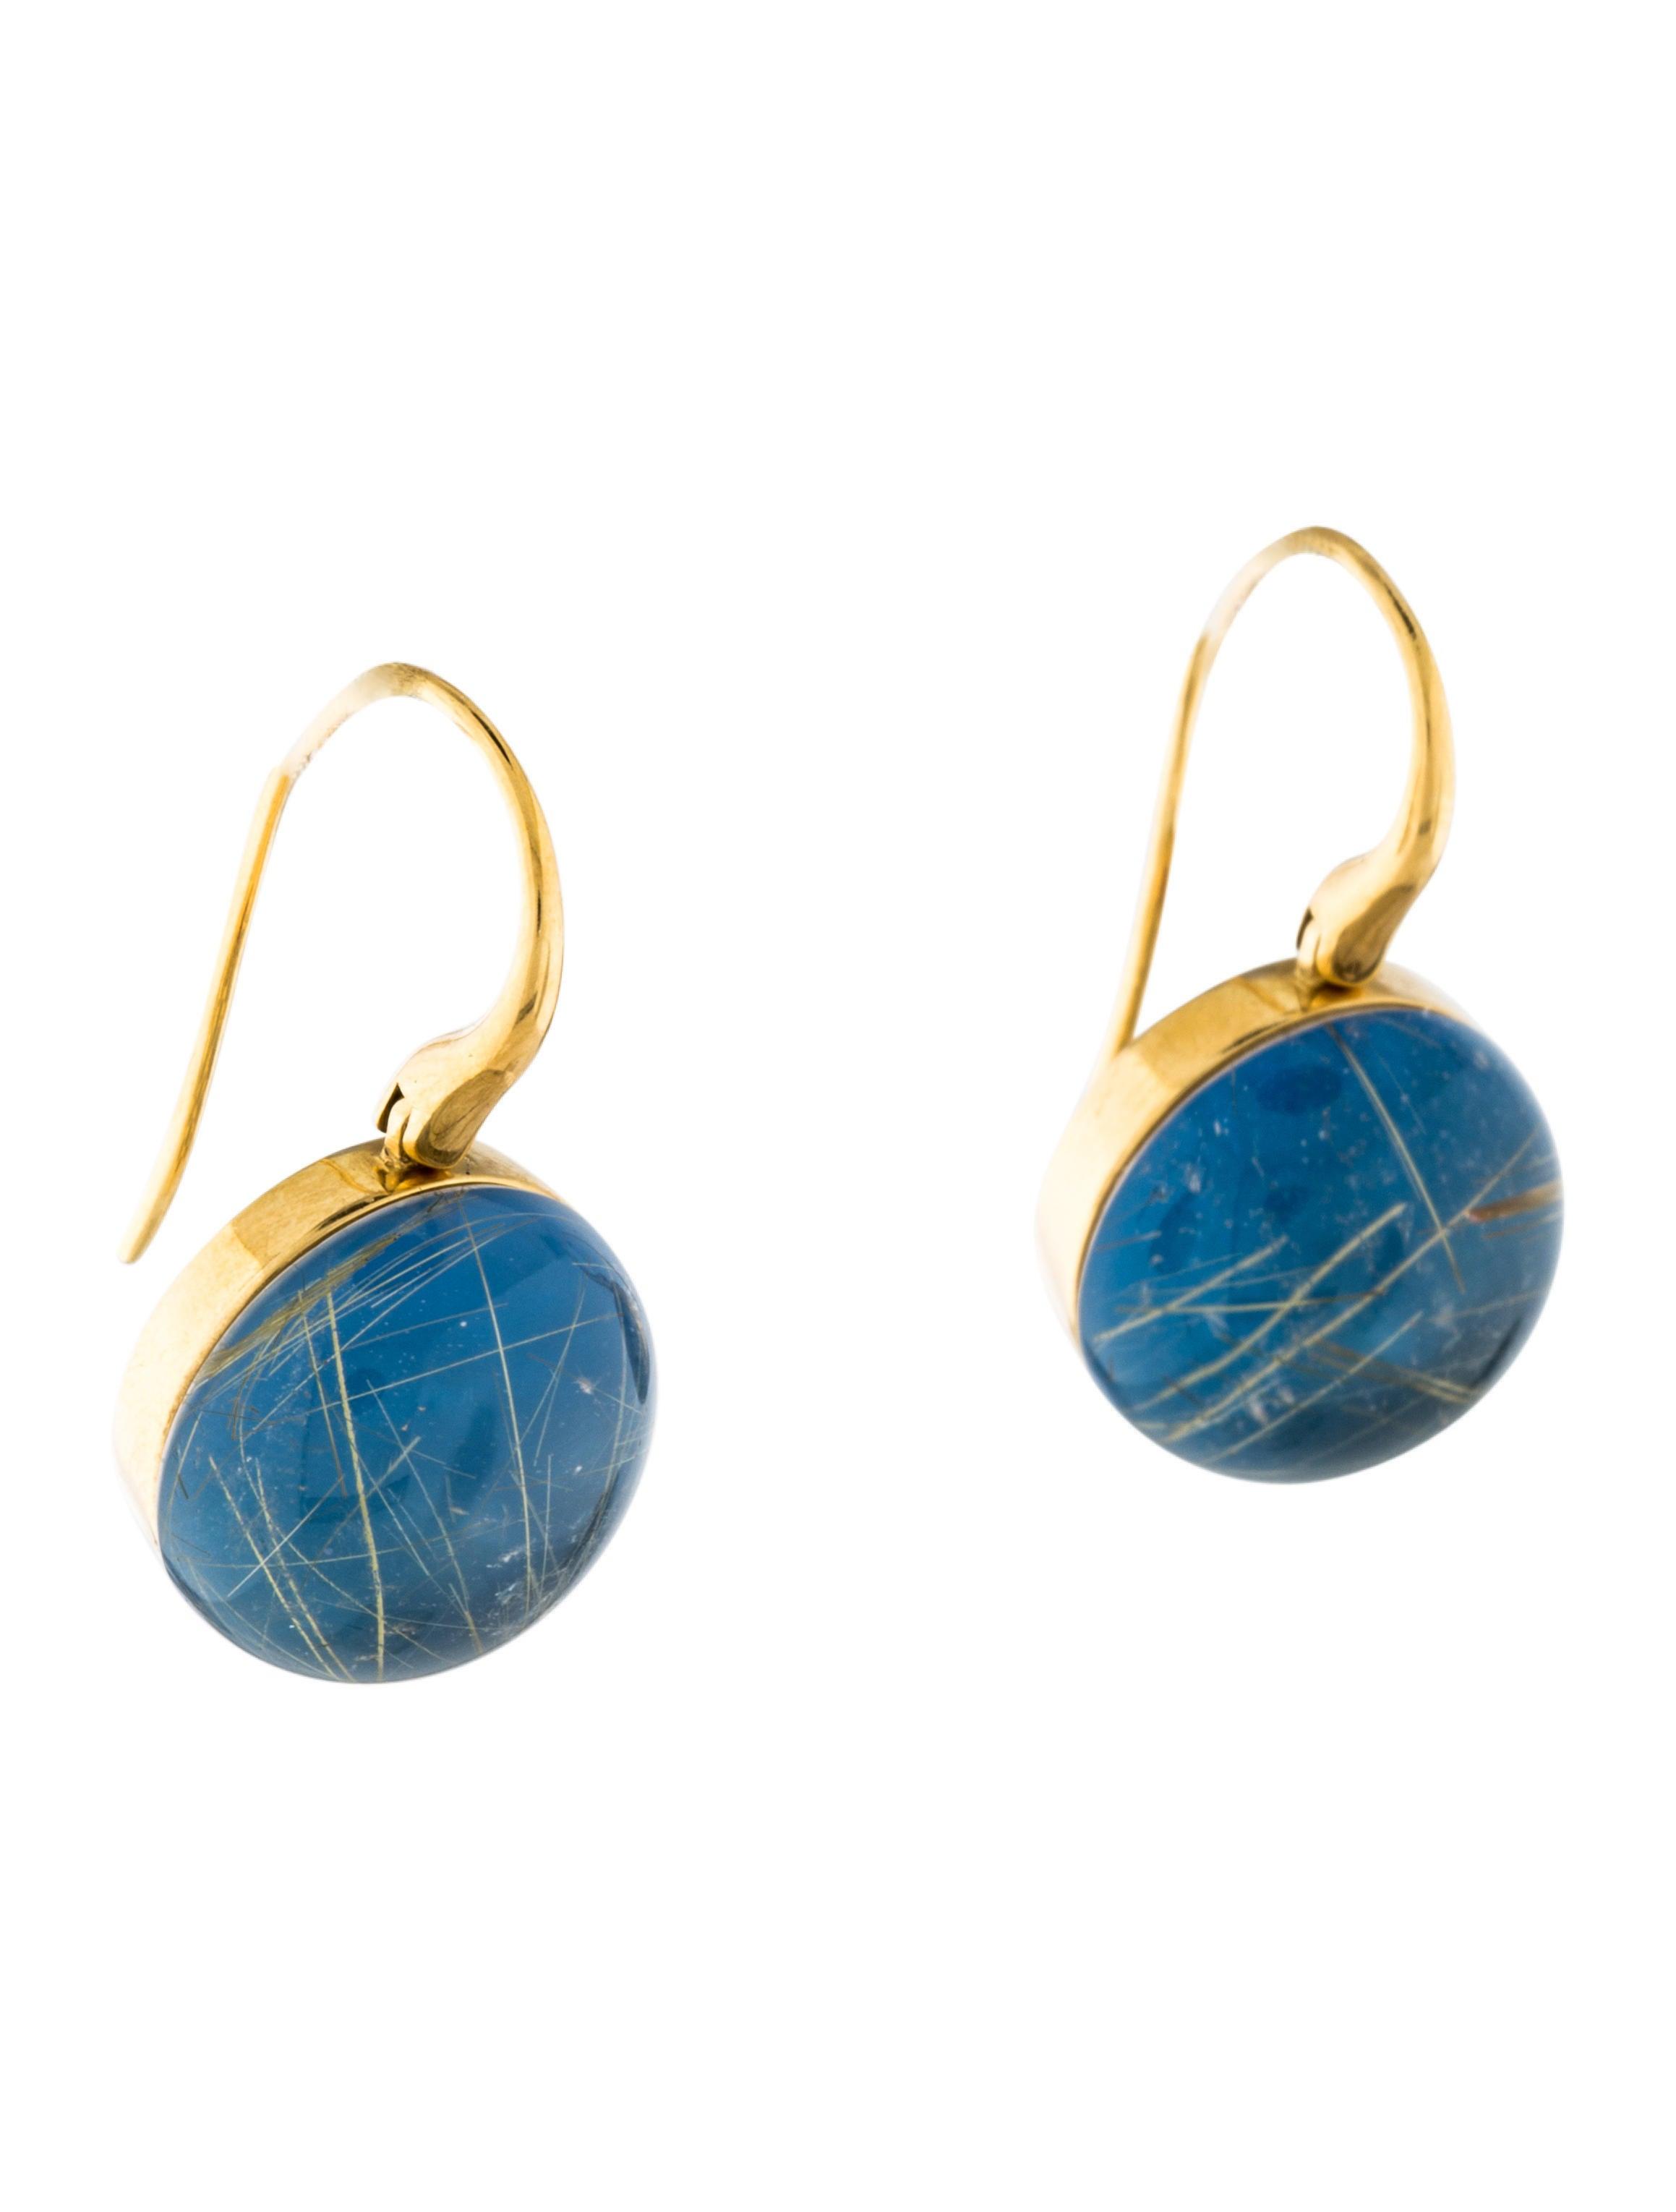 Roberto Coin Rutilated Quartz Drop Earrings Earrings